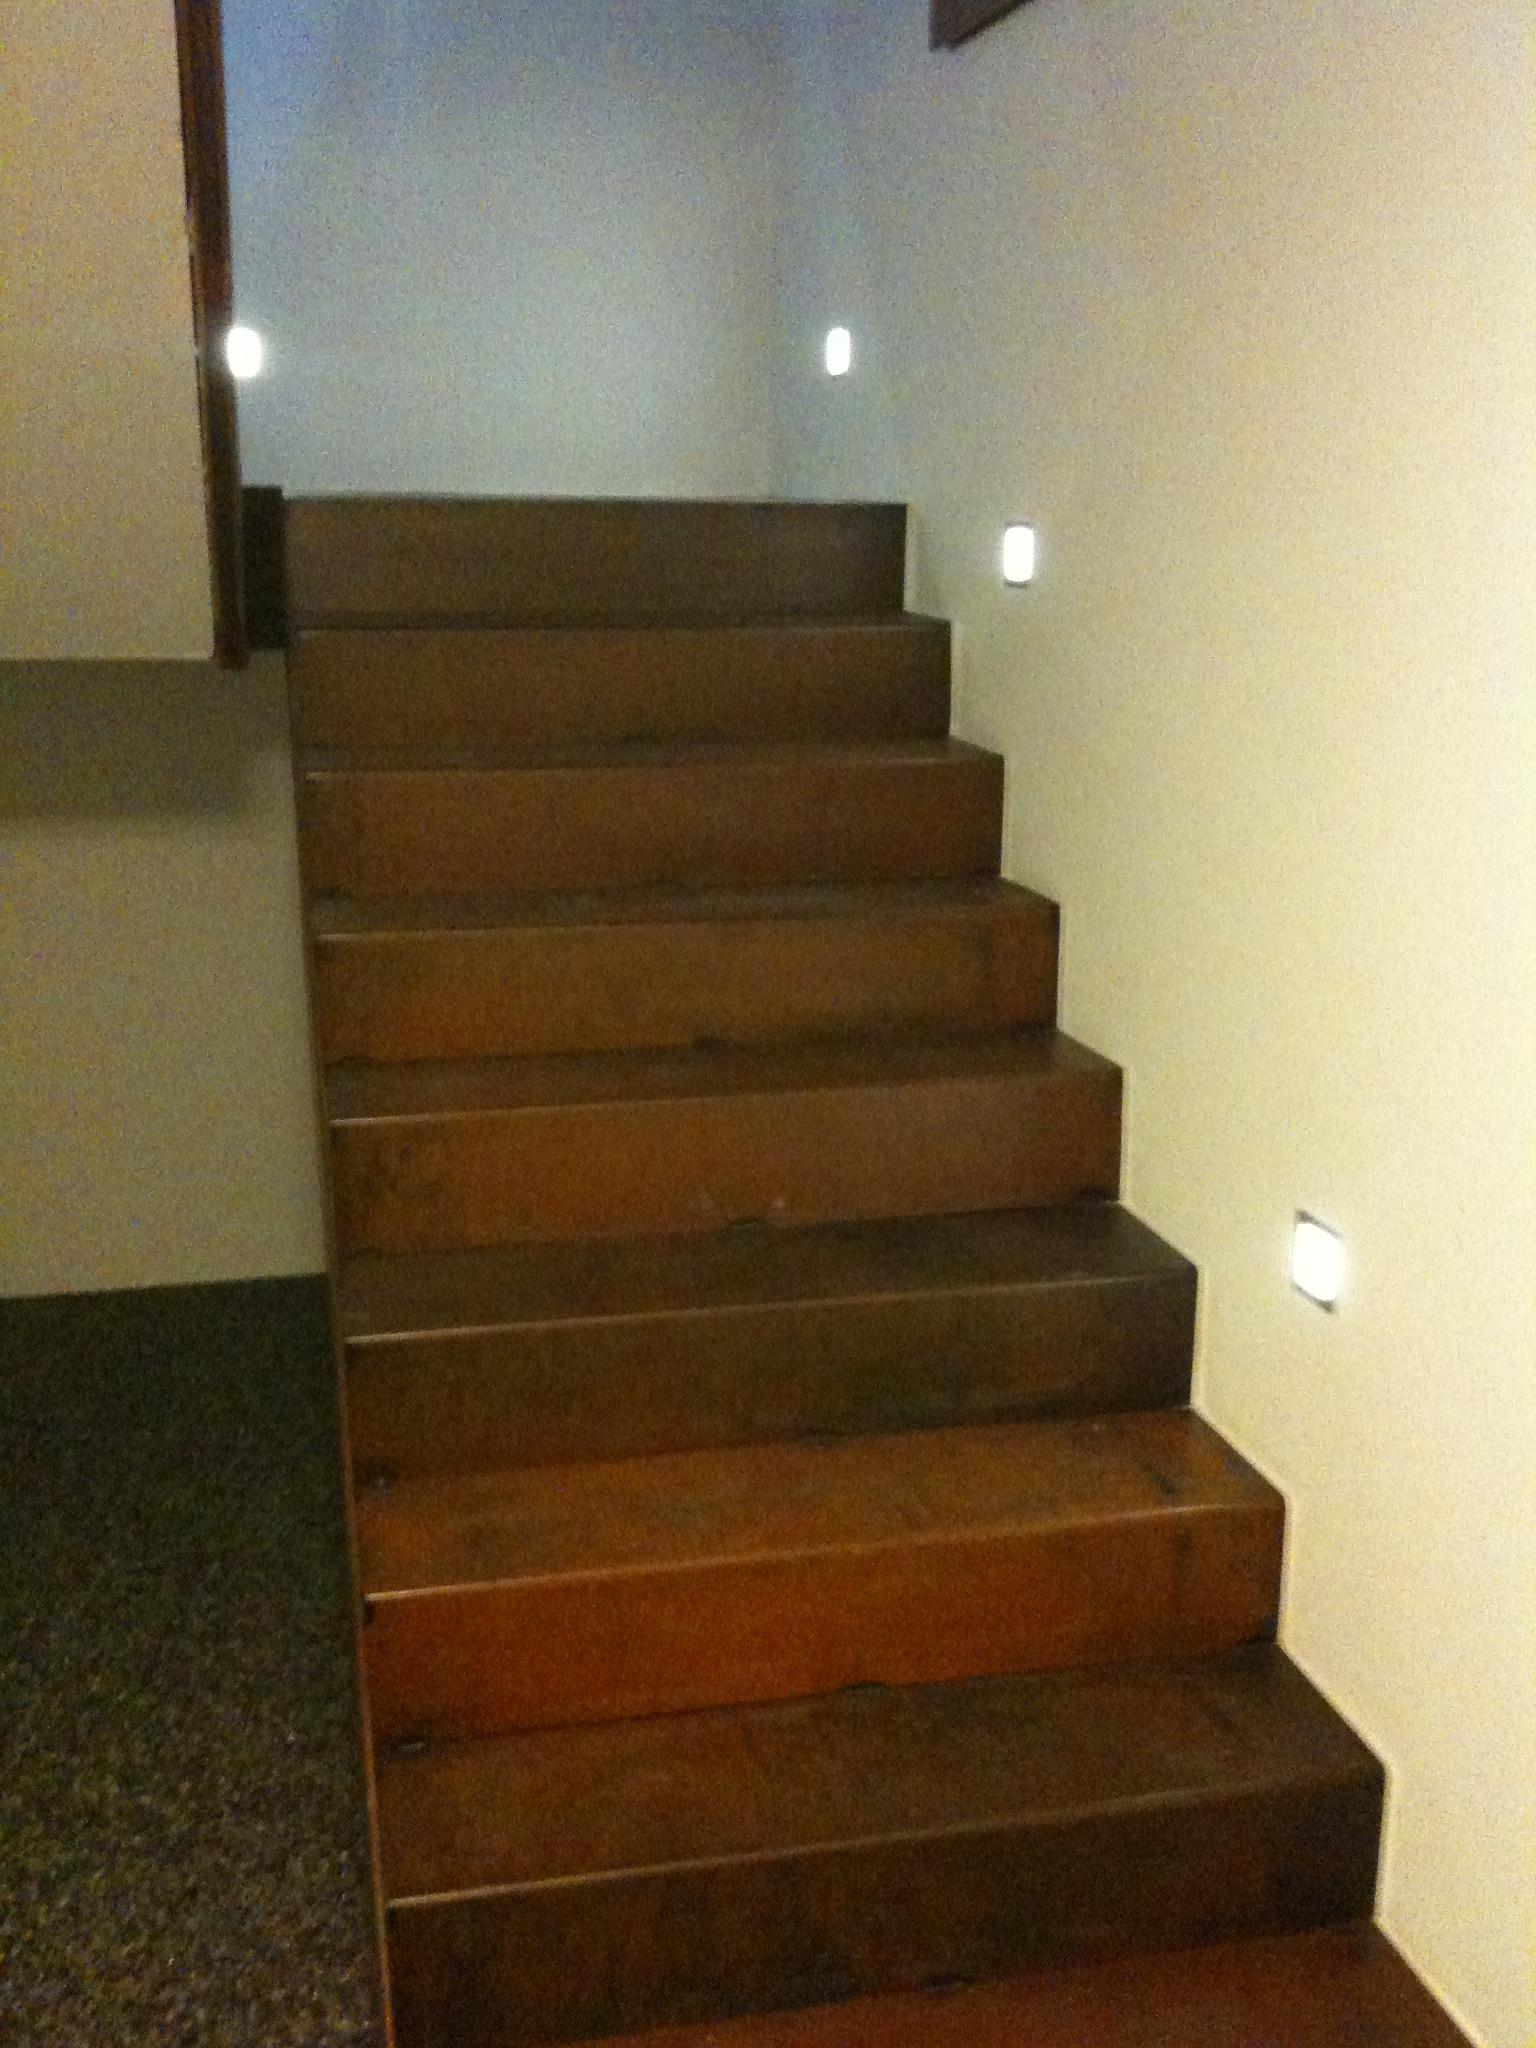 cor ten stahl faltwerktreppe preis auf anfrage metall. Black Bedroom Furniture Sets. Home Design Ideas